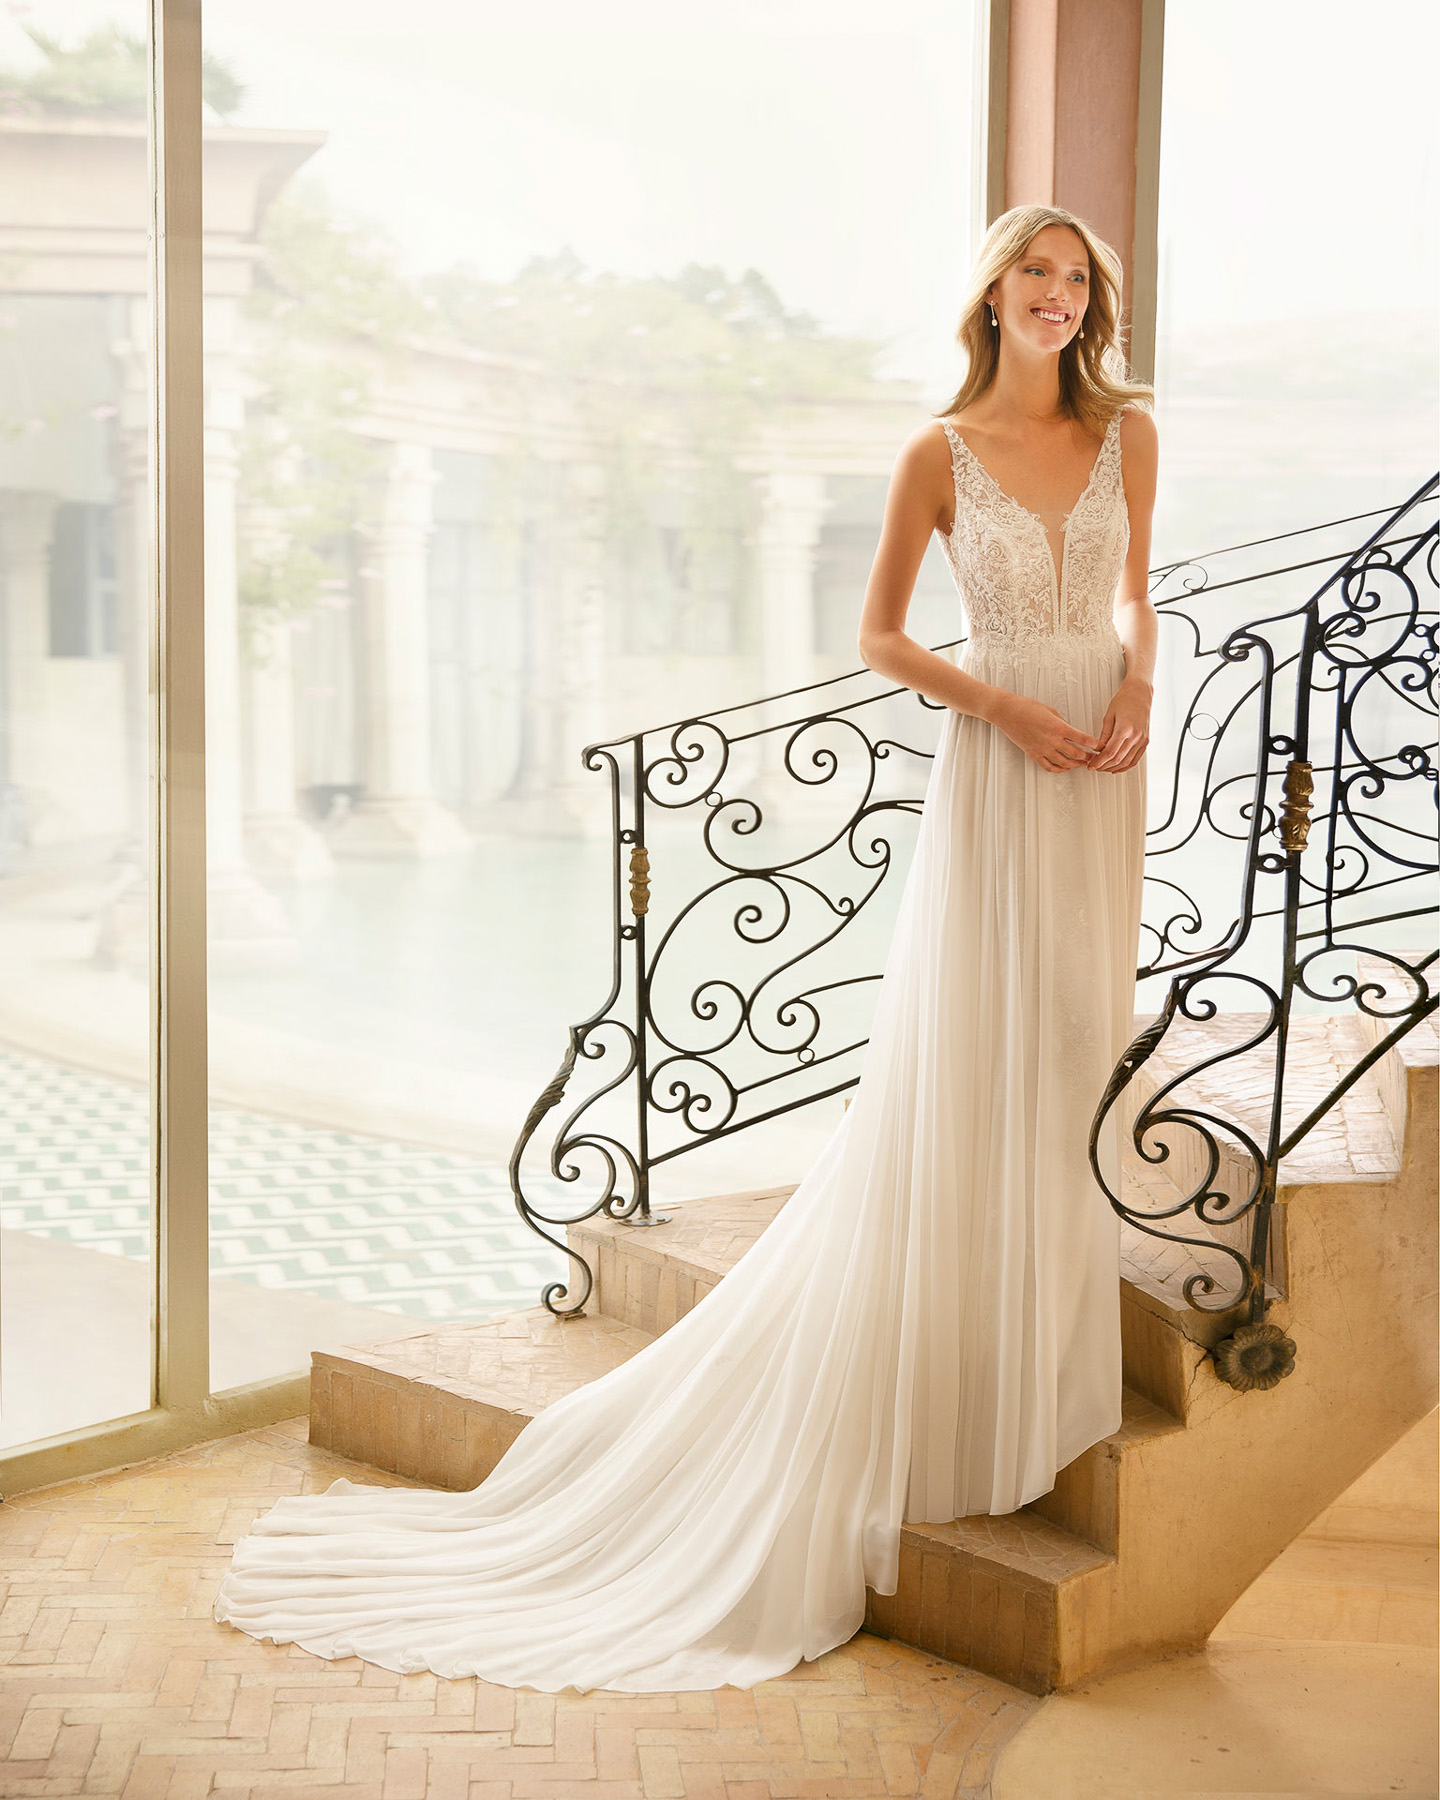 Sample Sale at Brides of Winchester   Brides of Winchester   Hampshire Bridal Boutique   Designer wedding boutique